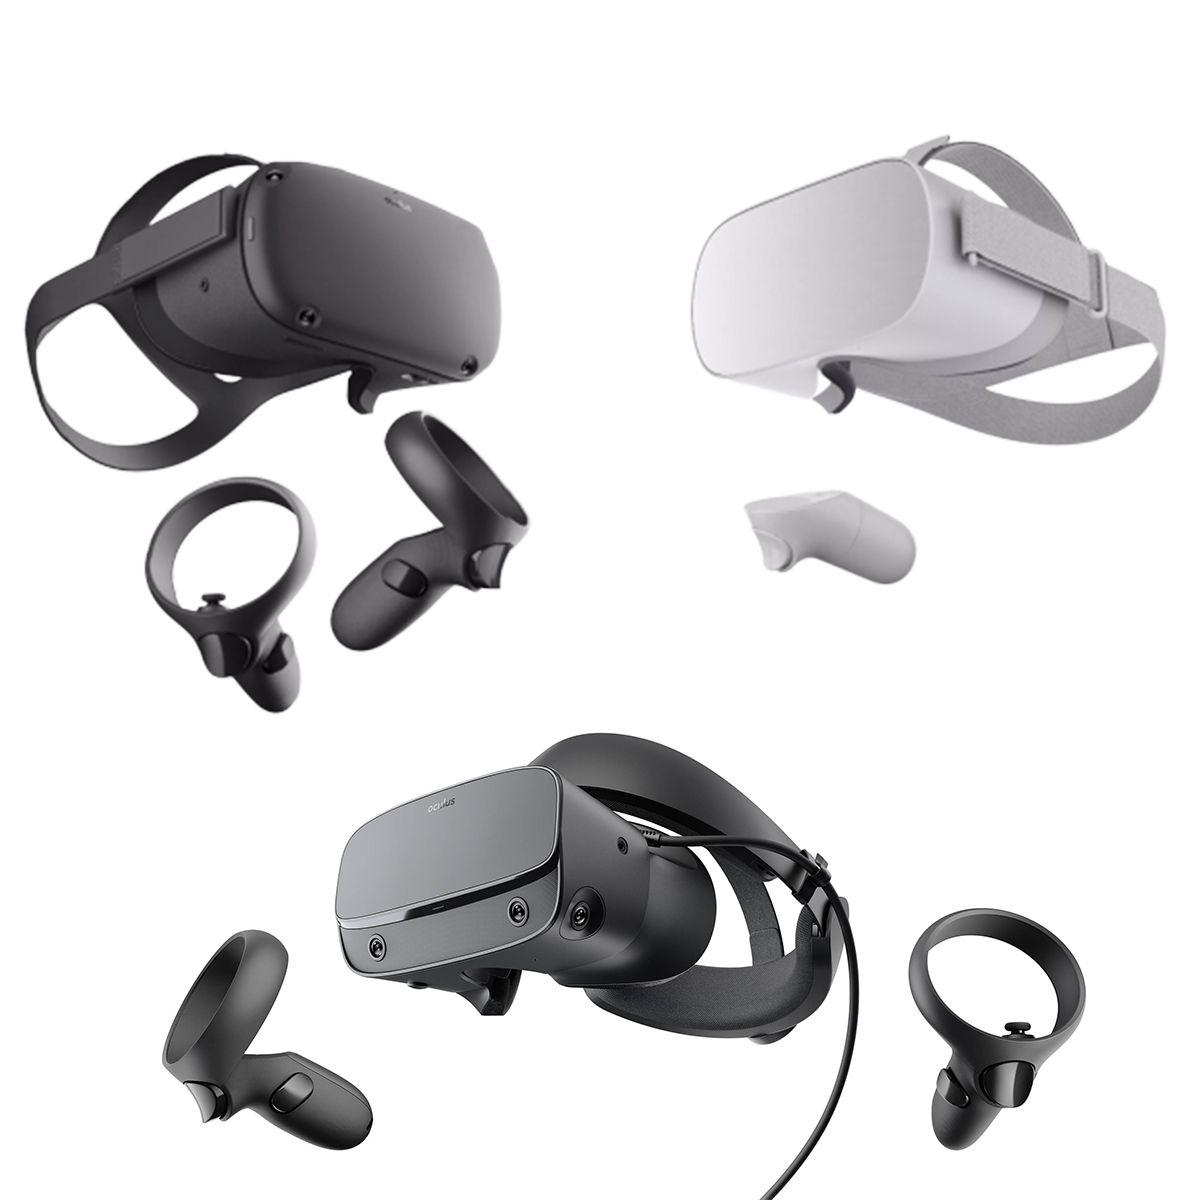 Oculus Vr Headset 2019 Collection 3d Model Oculus Go Quest